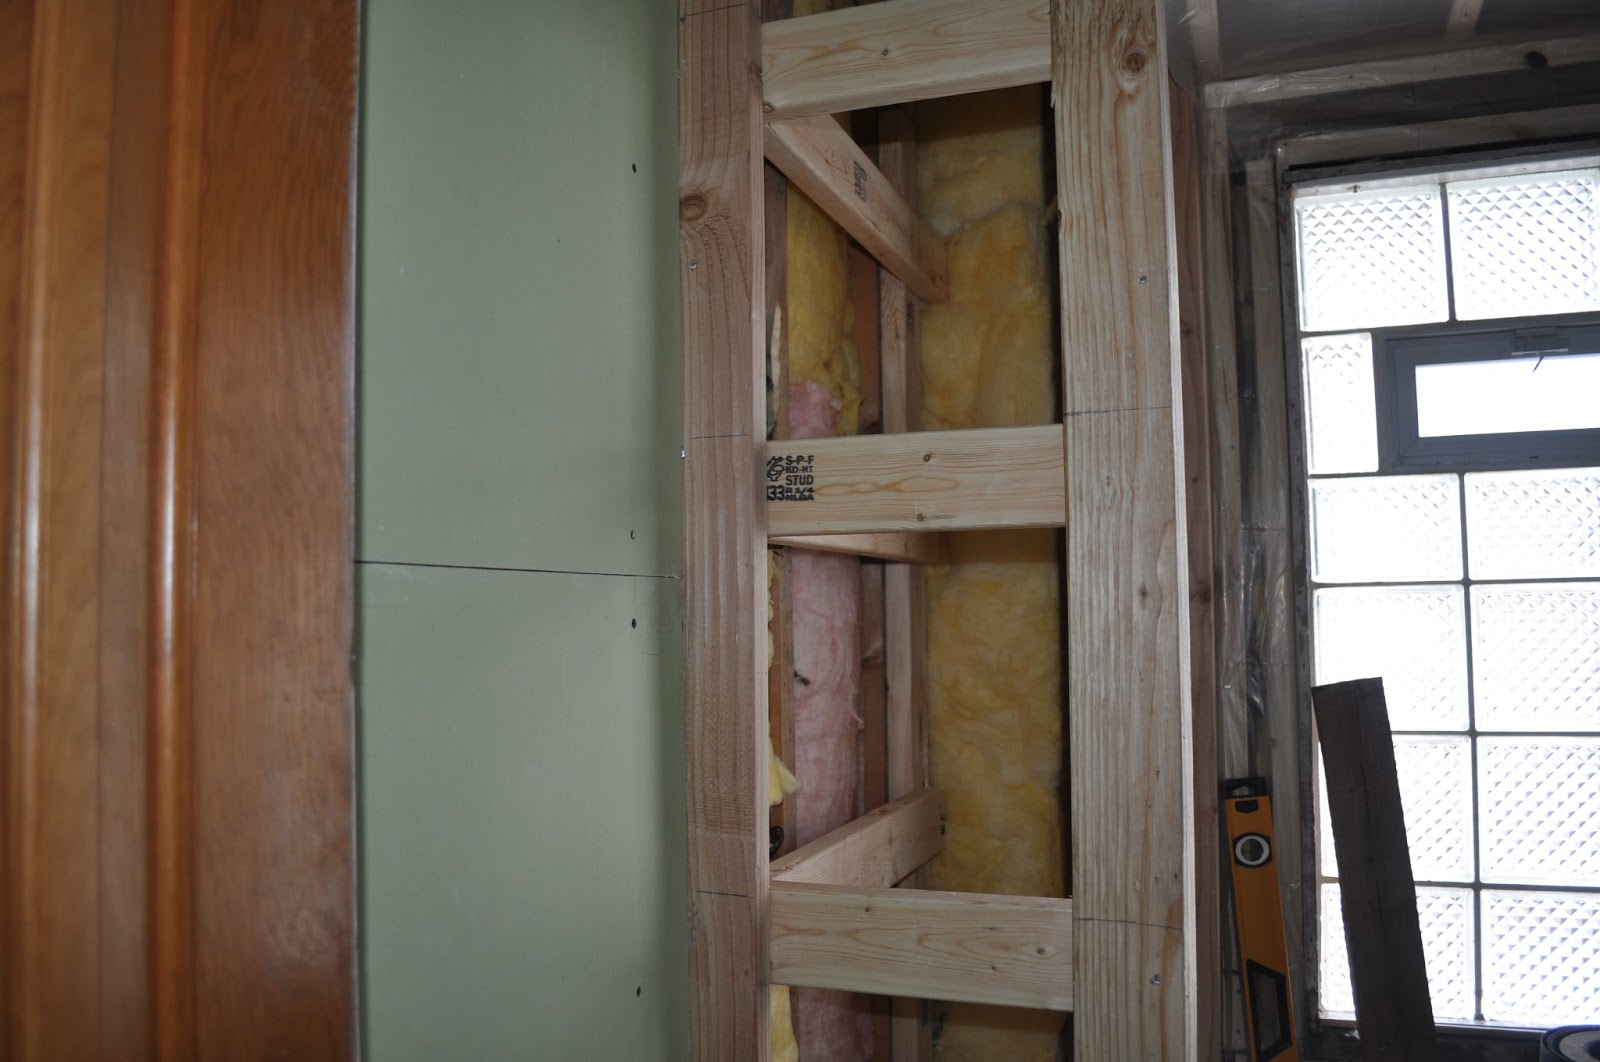 Carri Us Home: DIY Built-in Bathroom Cabinet Part I